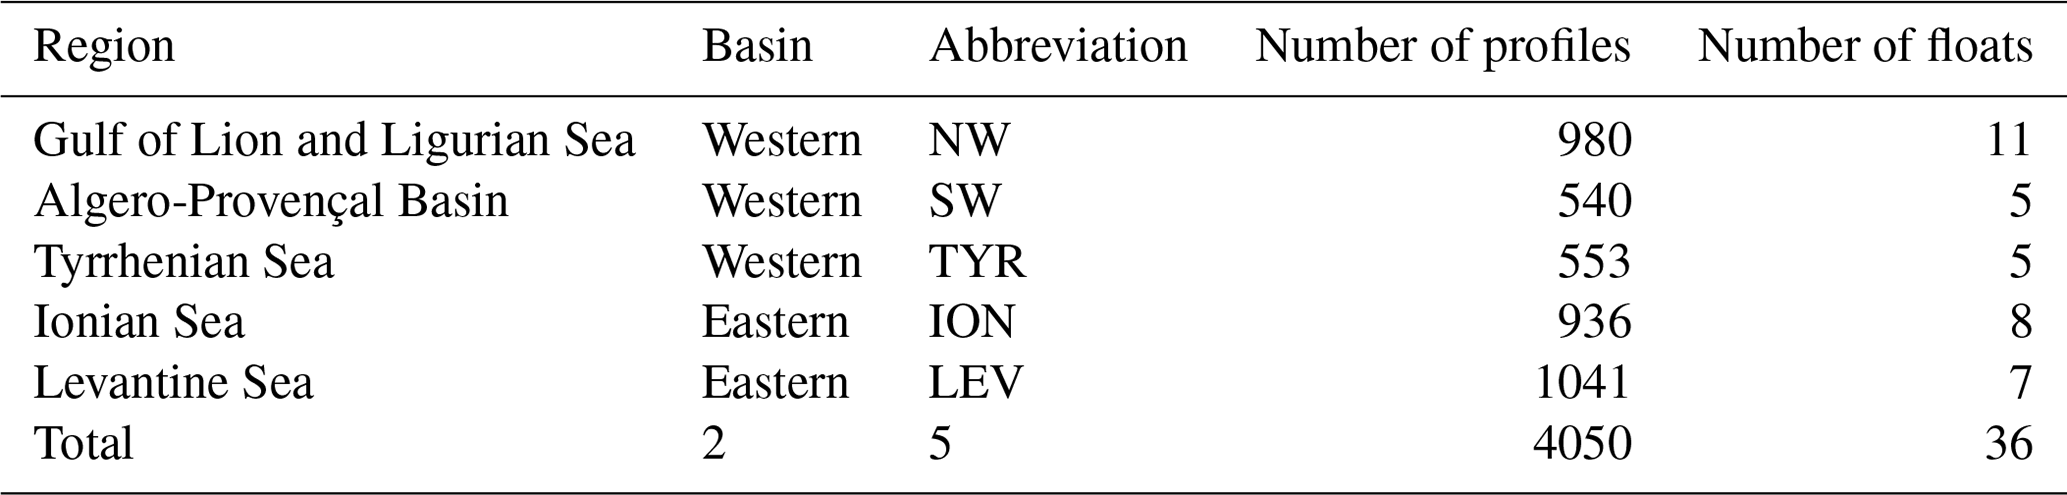 BG - Bio-optical characterization of subsurface chlorophyll